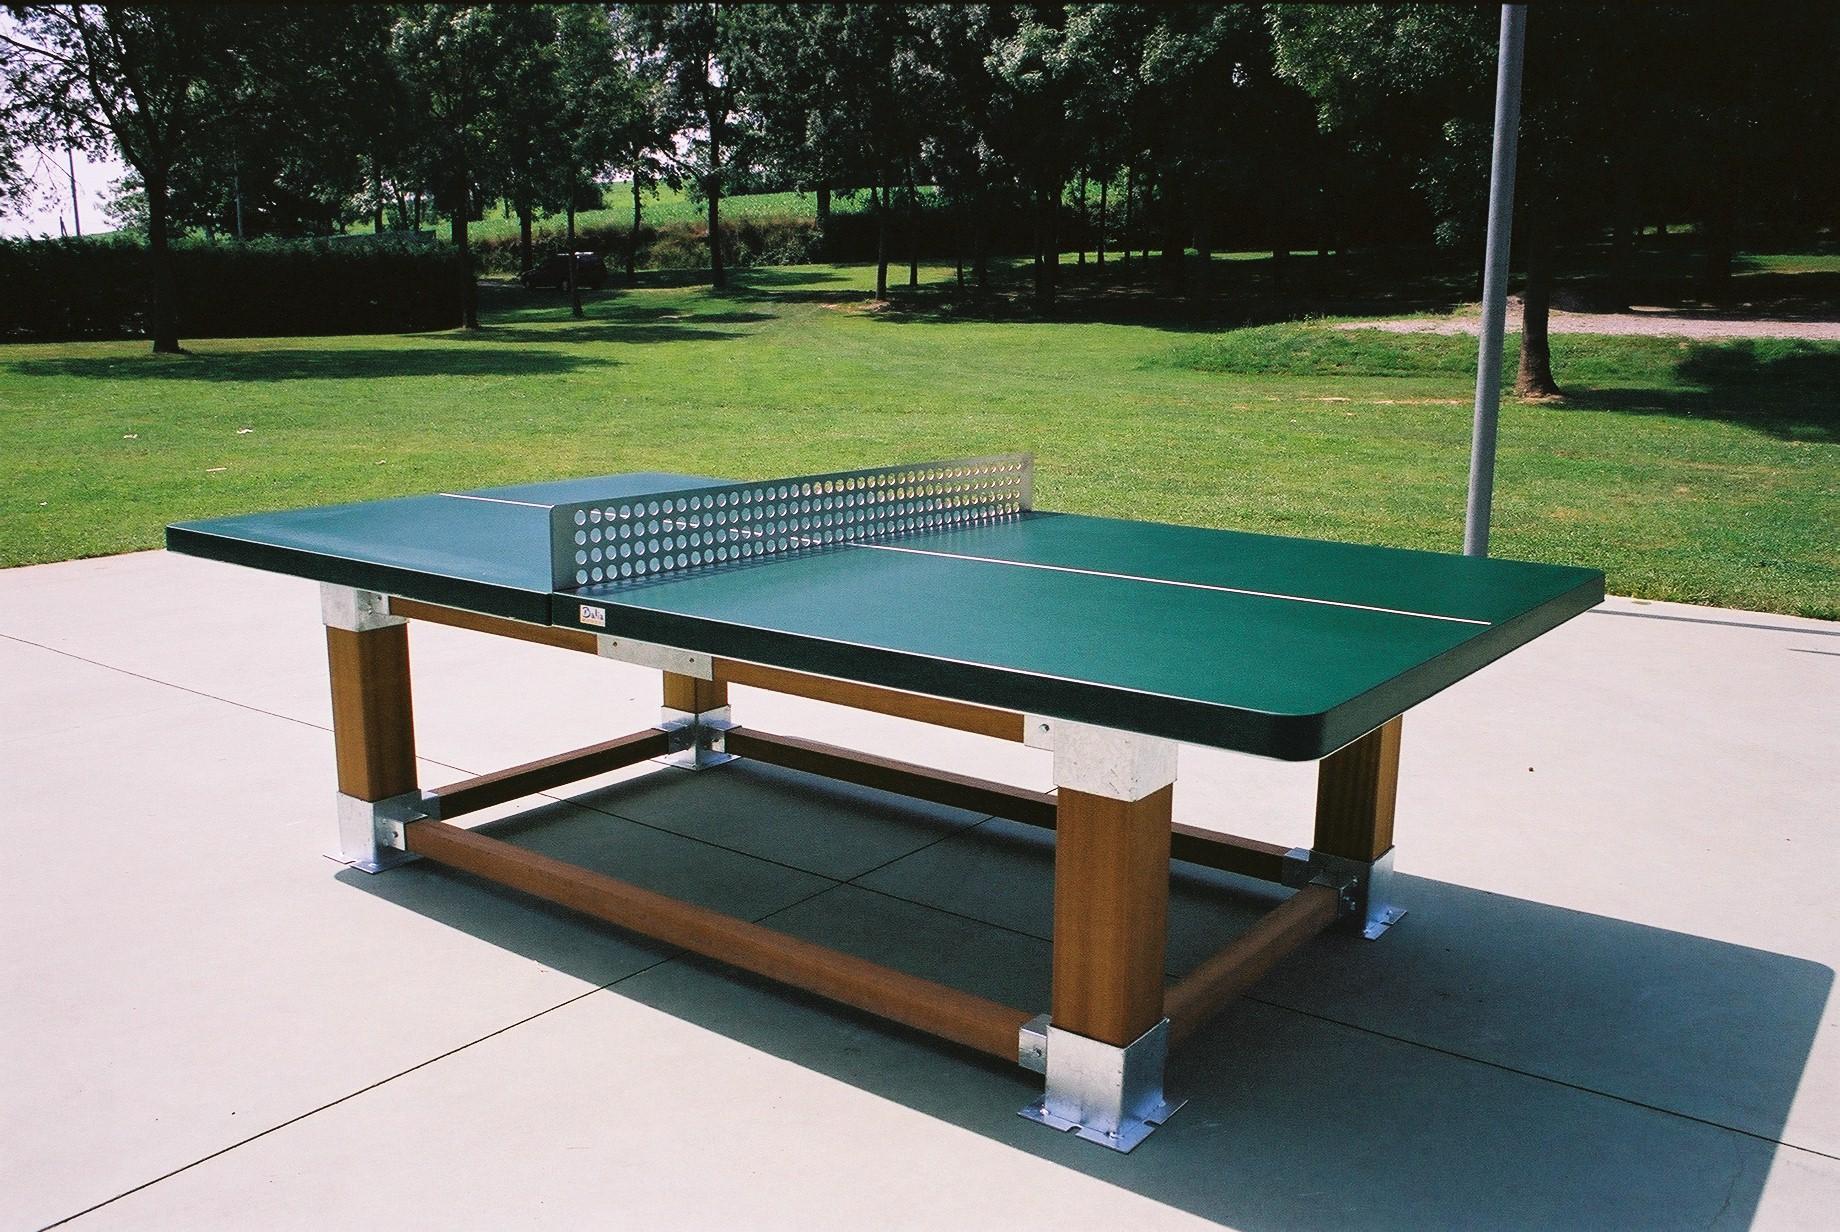 Diy Outdoor Ping Pong Table Designs